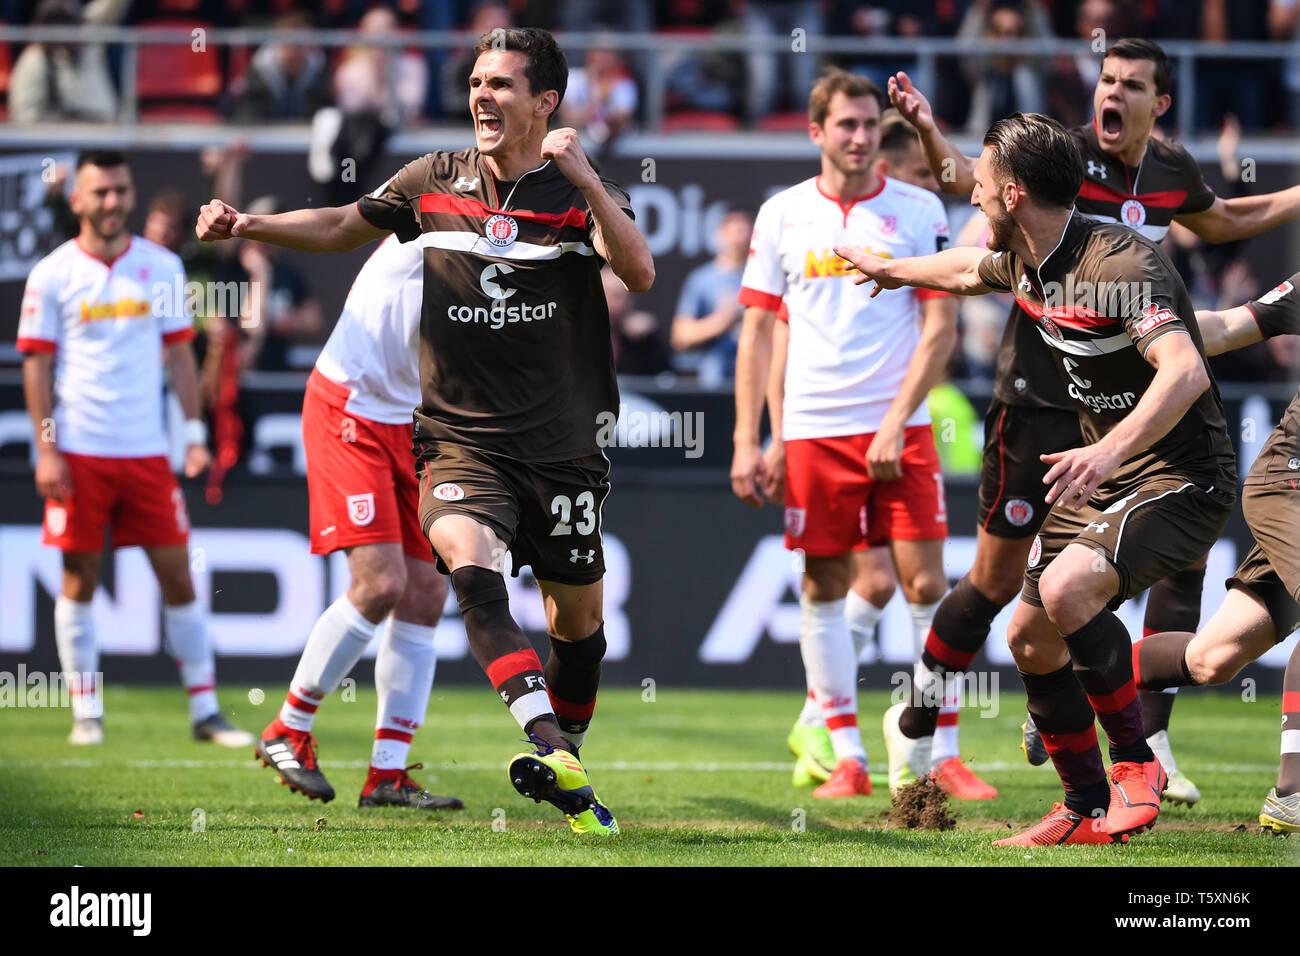 HAMBURG, GERMANY - APRIL 27: Johannes Flum (L) of FC Sankt Pauli celebrates after scoring his team's first goal during the second Bundesliga match bet - Stock Image